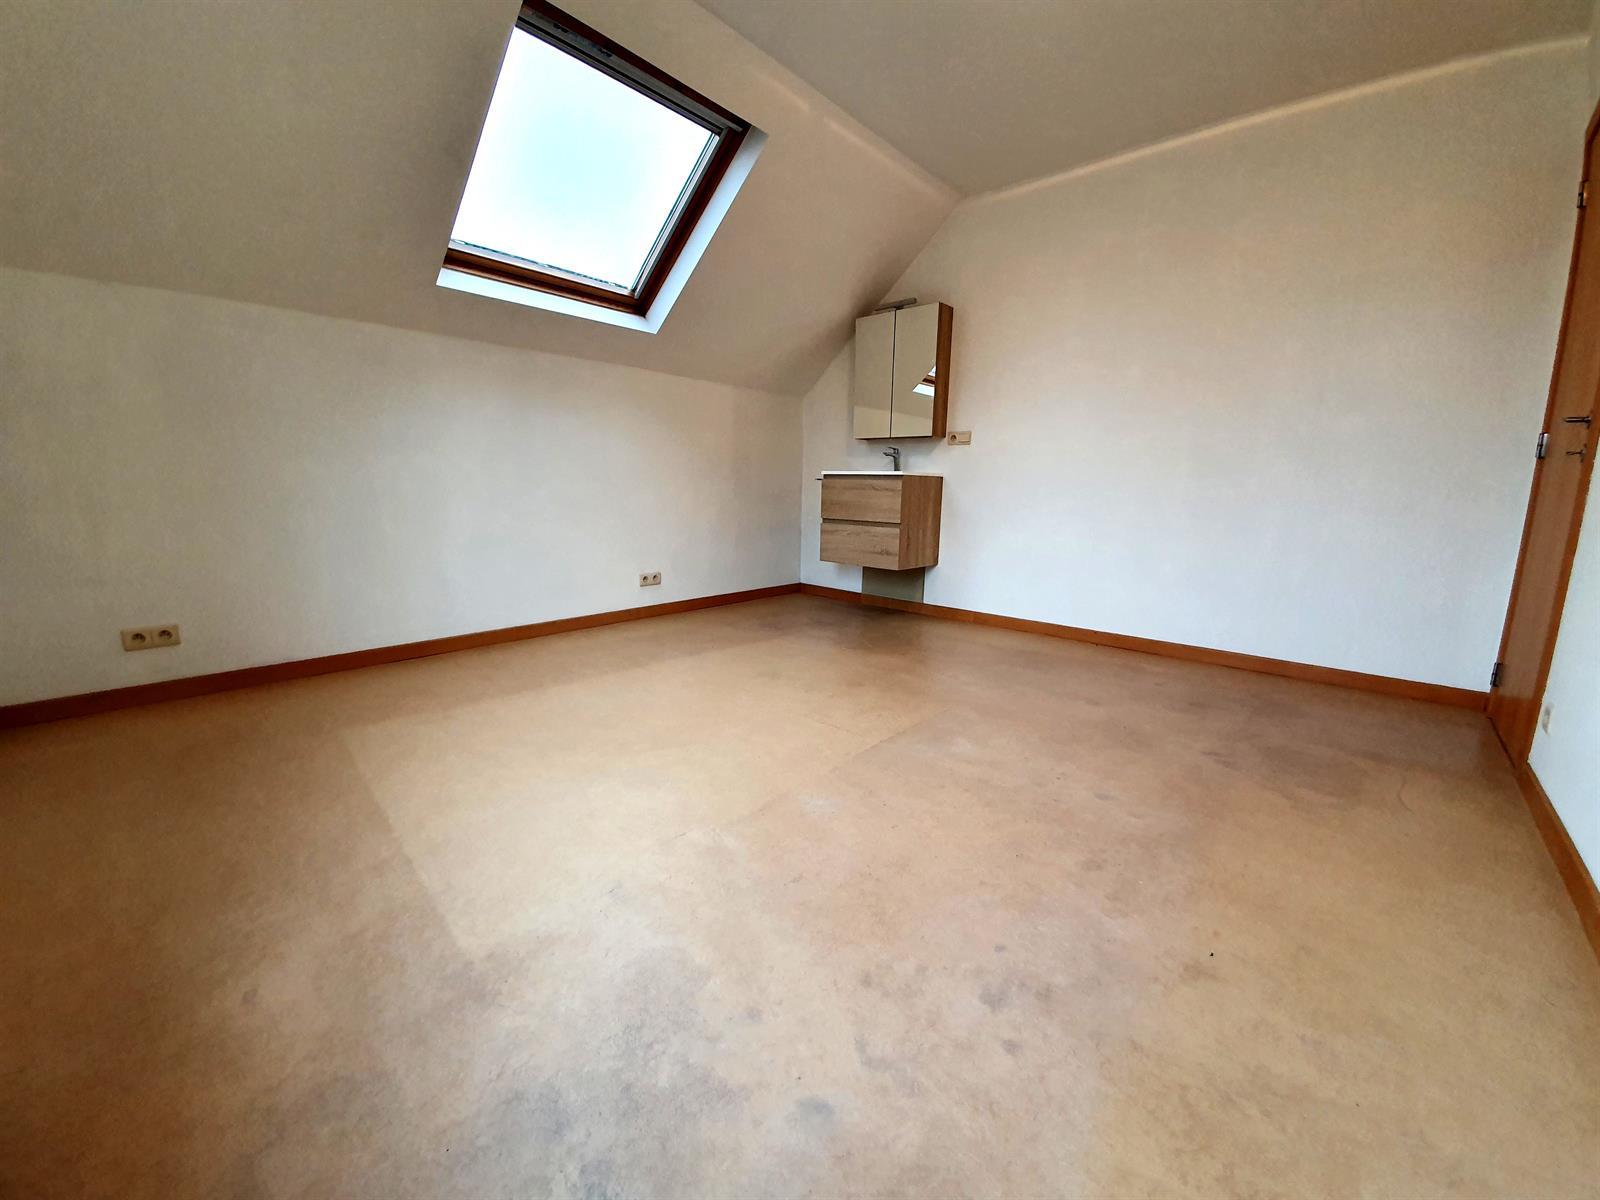 Appartement - Chaumont-Gistoux - #4226214-7